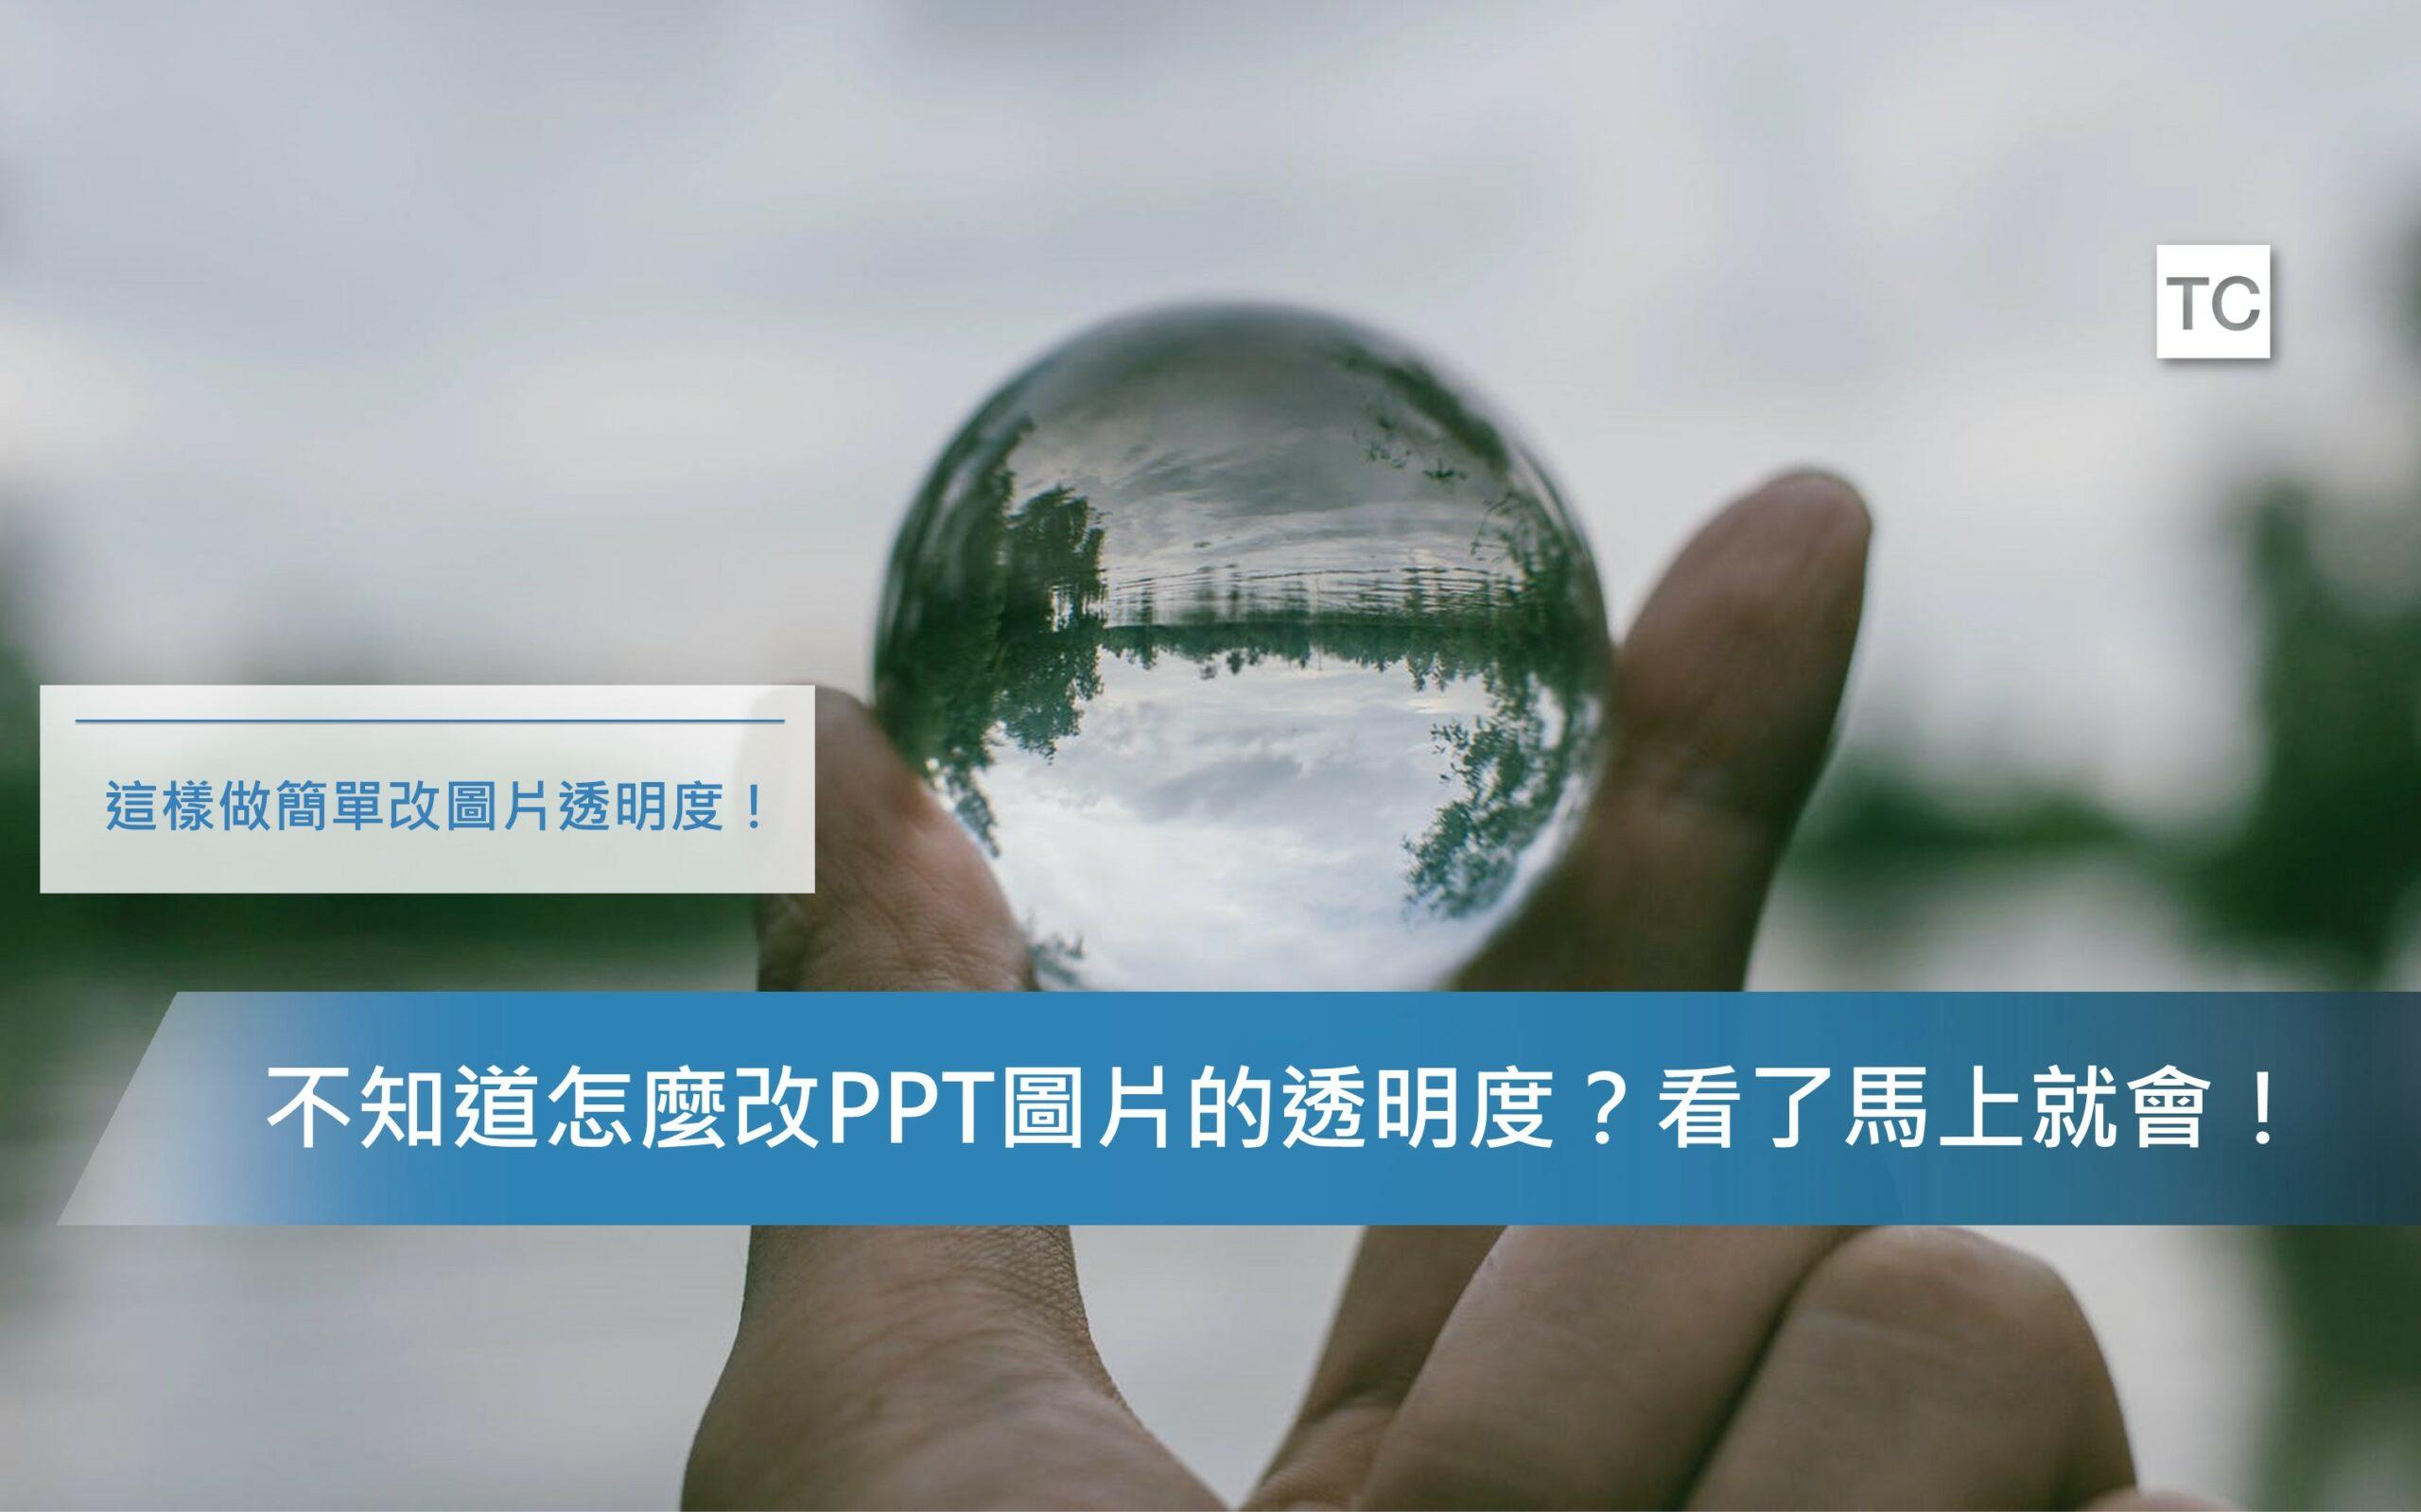 PPT教學|你還不會調整PPT圖案透明度嗎?試試這個方法!